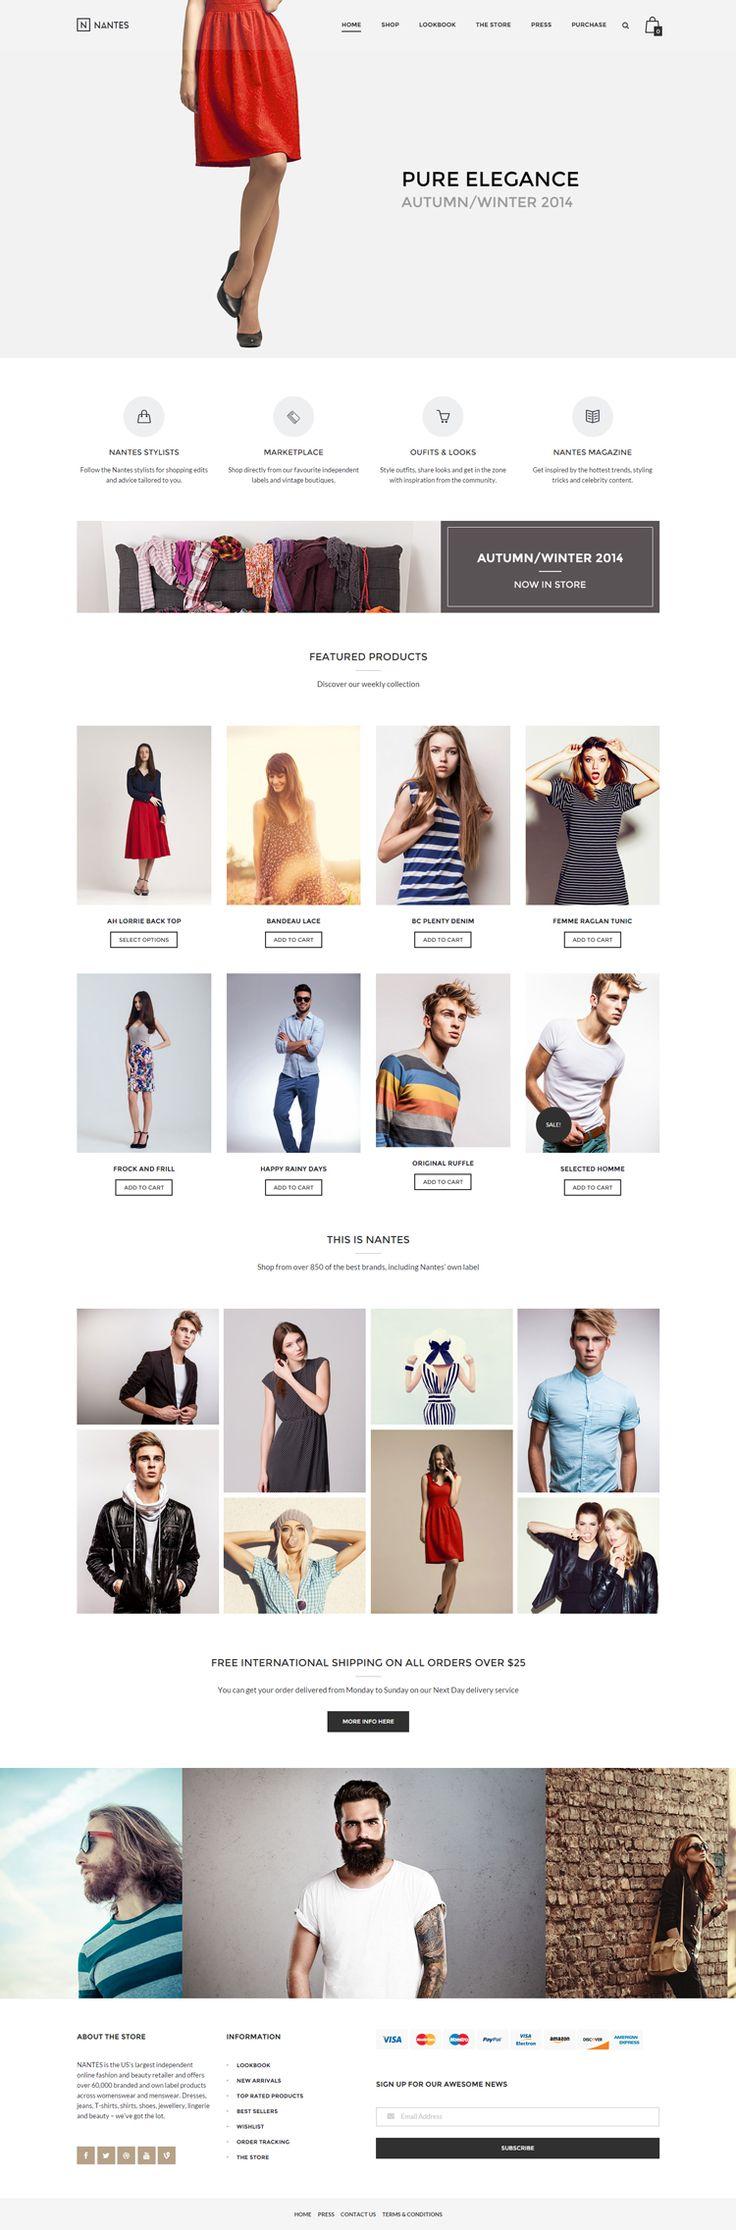 #fashion, gid